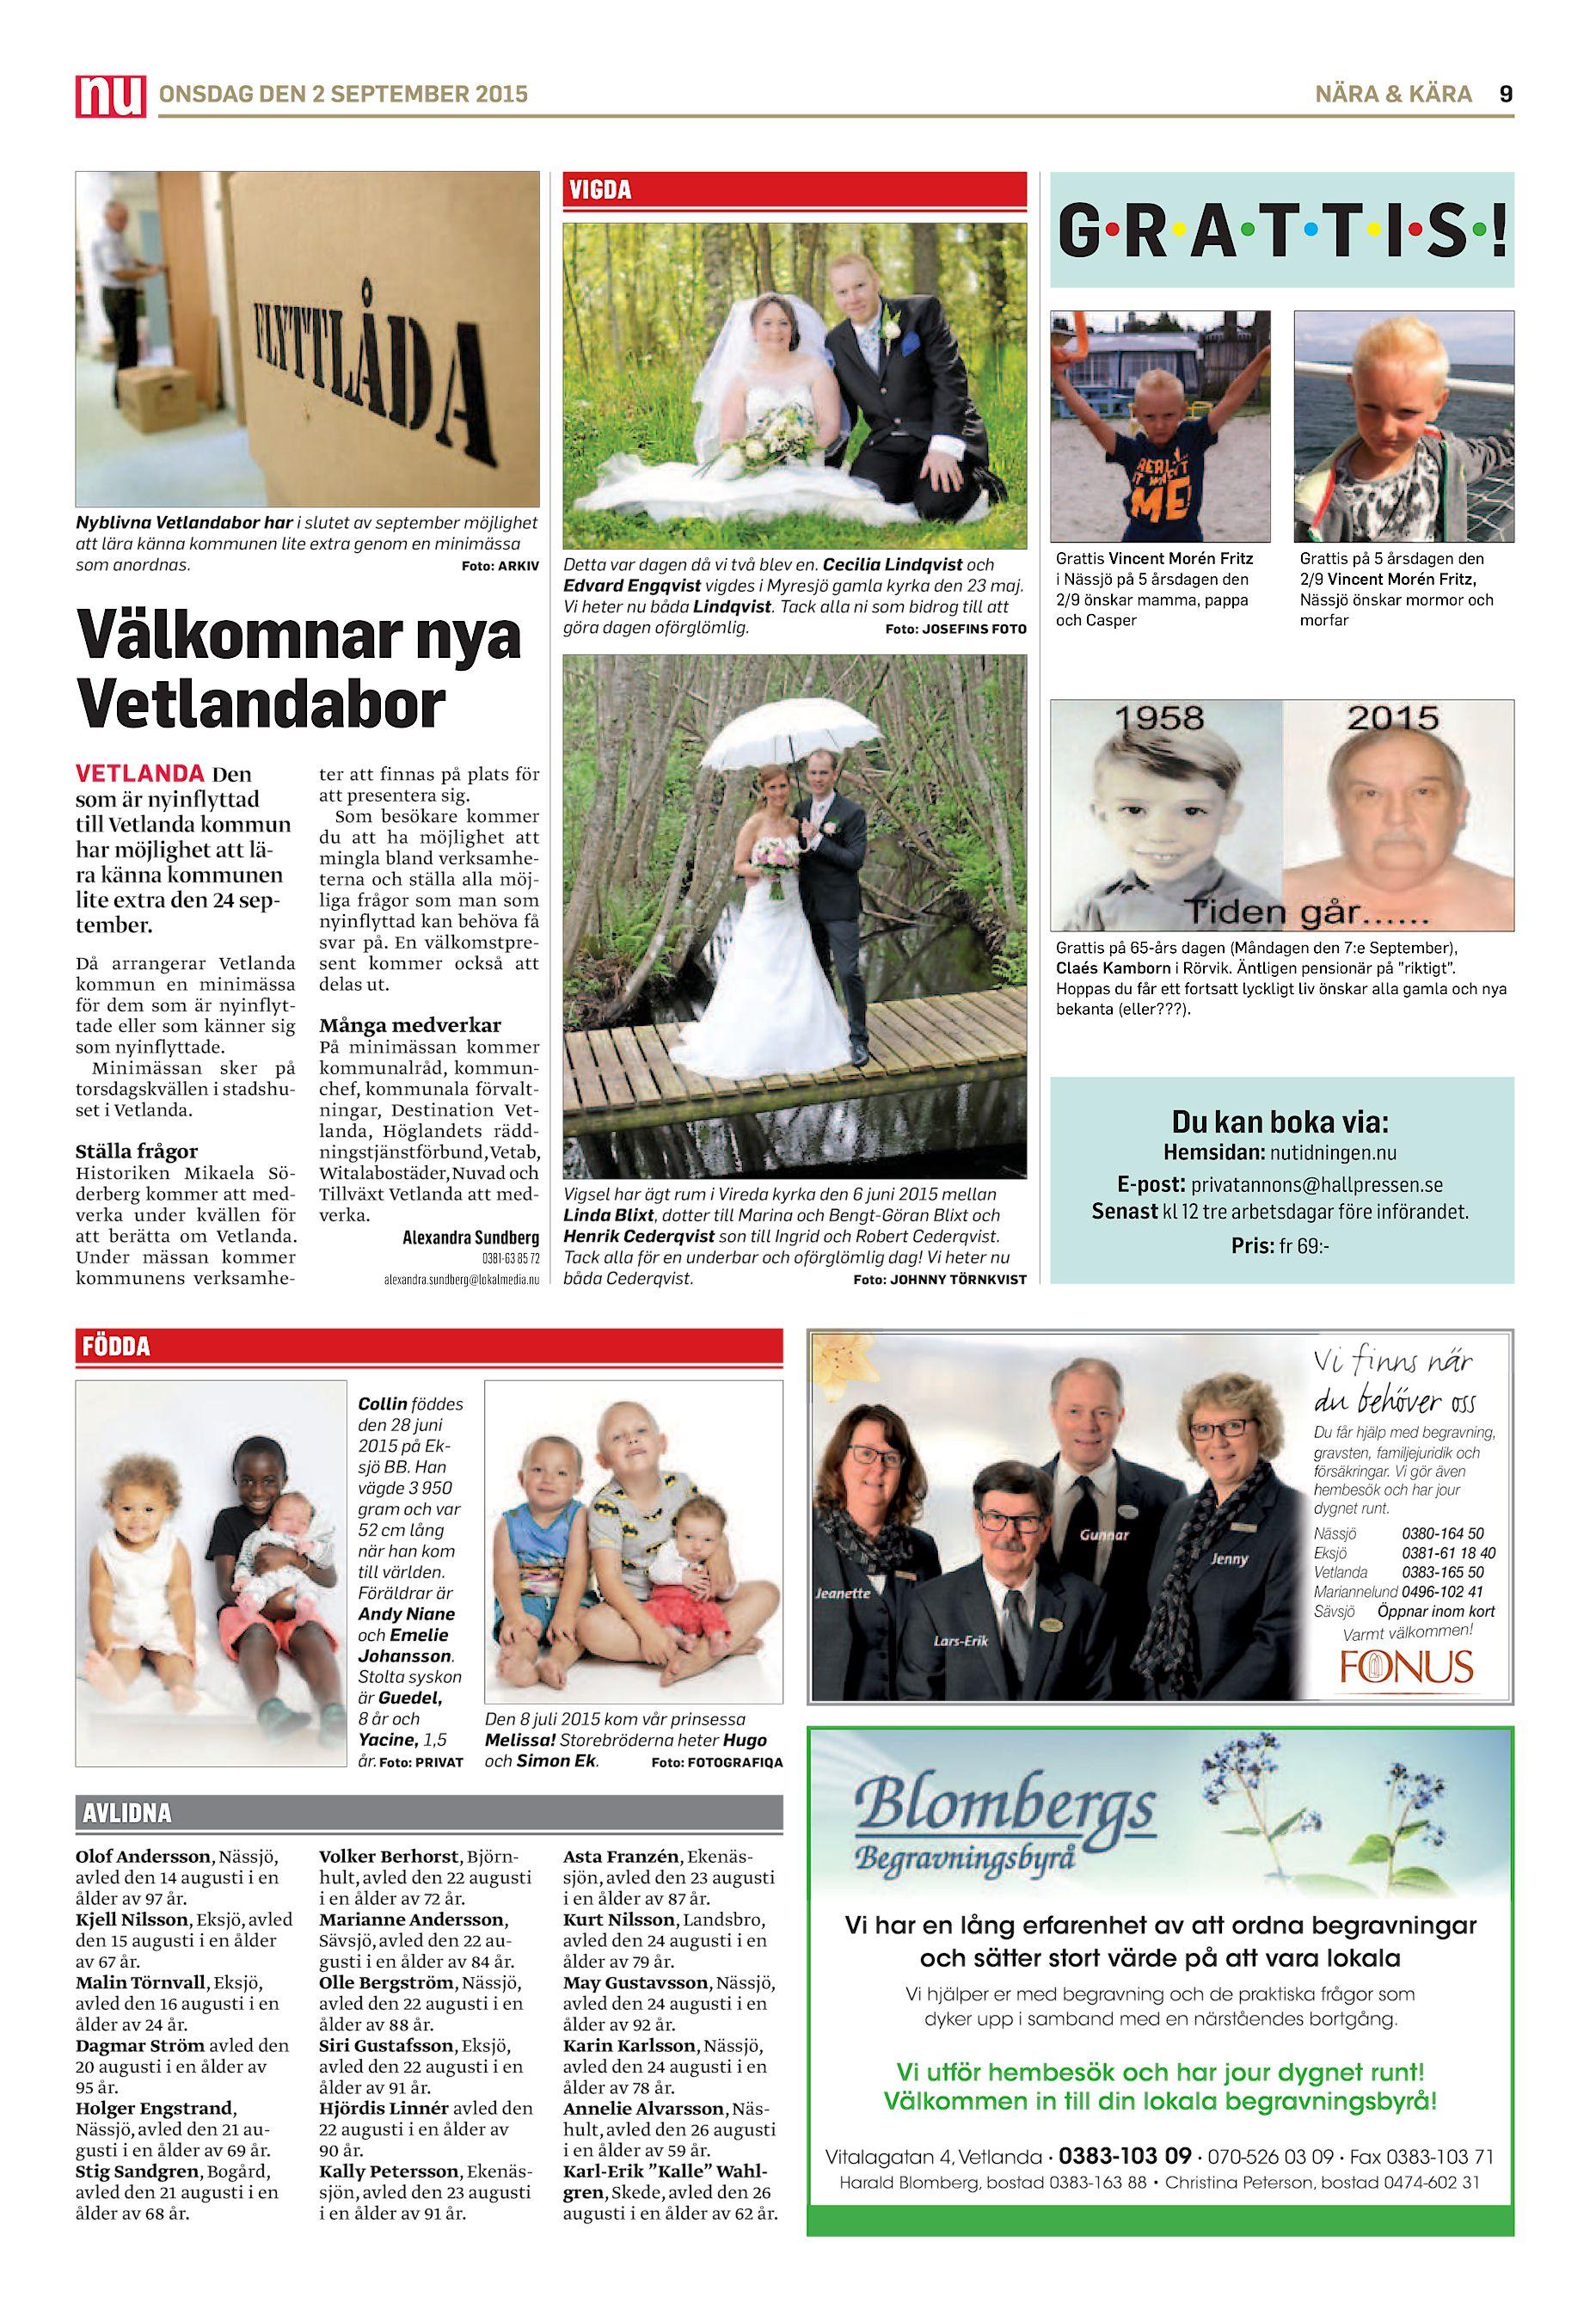 Annika Titusson, Norra Ekagrd 6, Vetlanda | unam.net